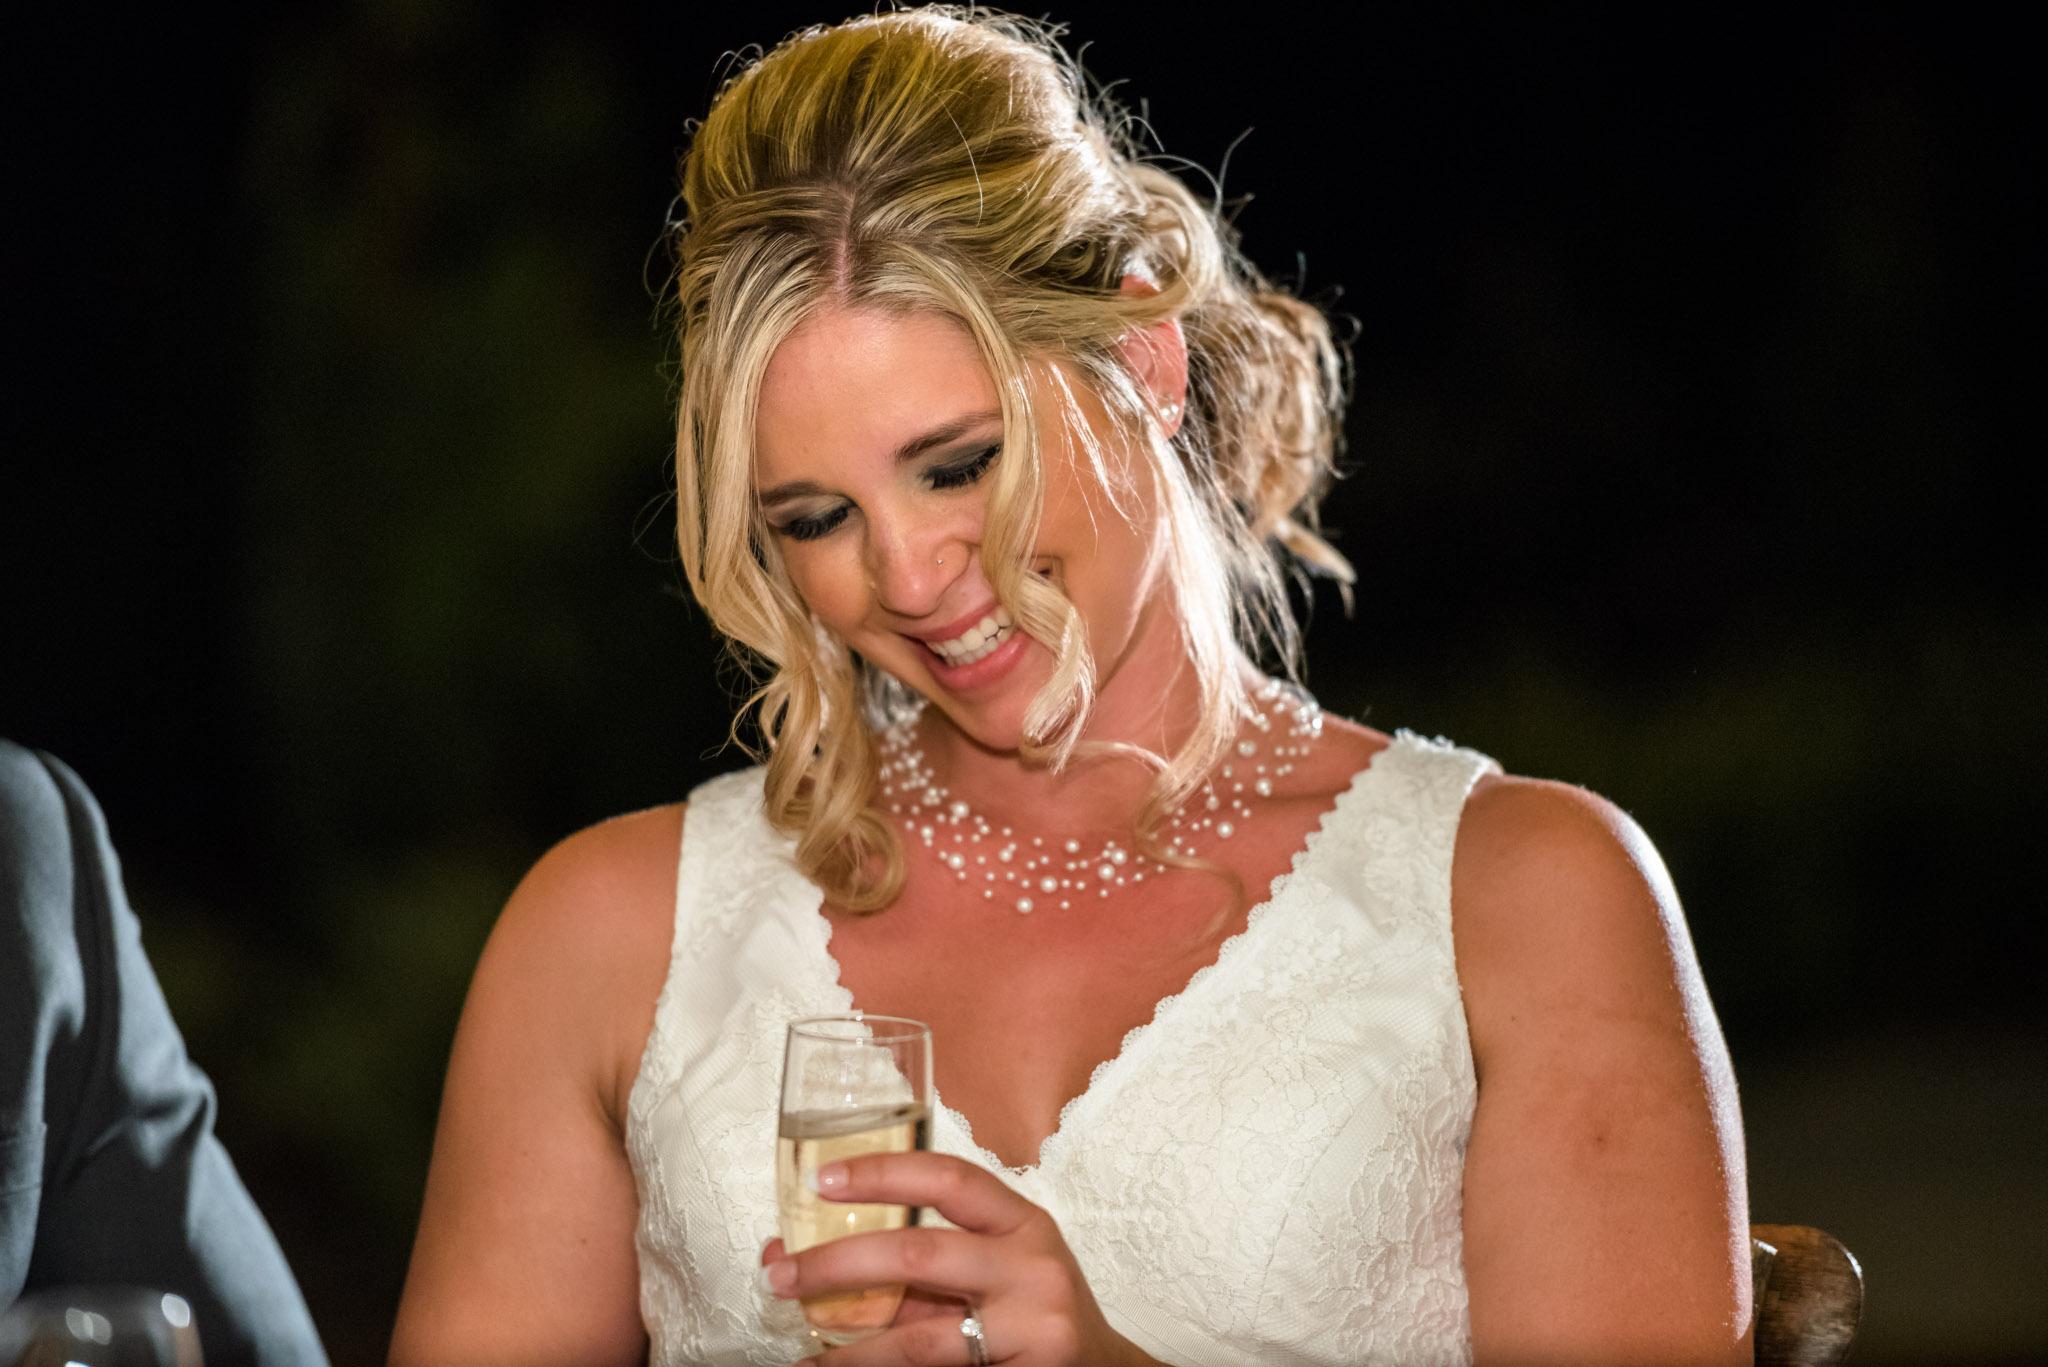 Avensole-Winery-Temecula-Wedding-Josh-and-Olivia-4027.JPG